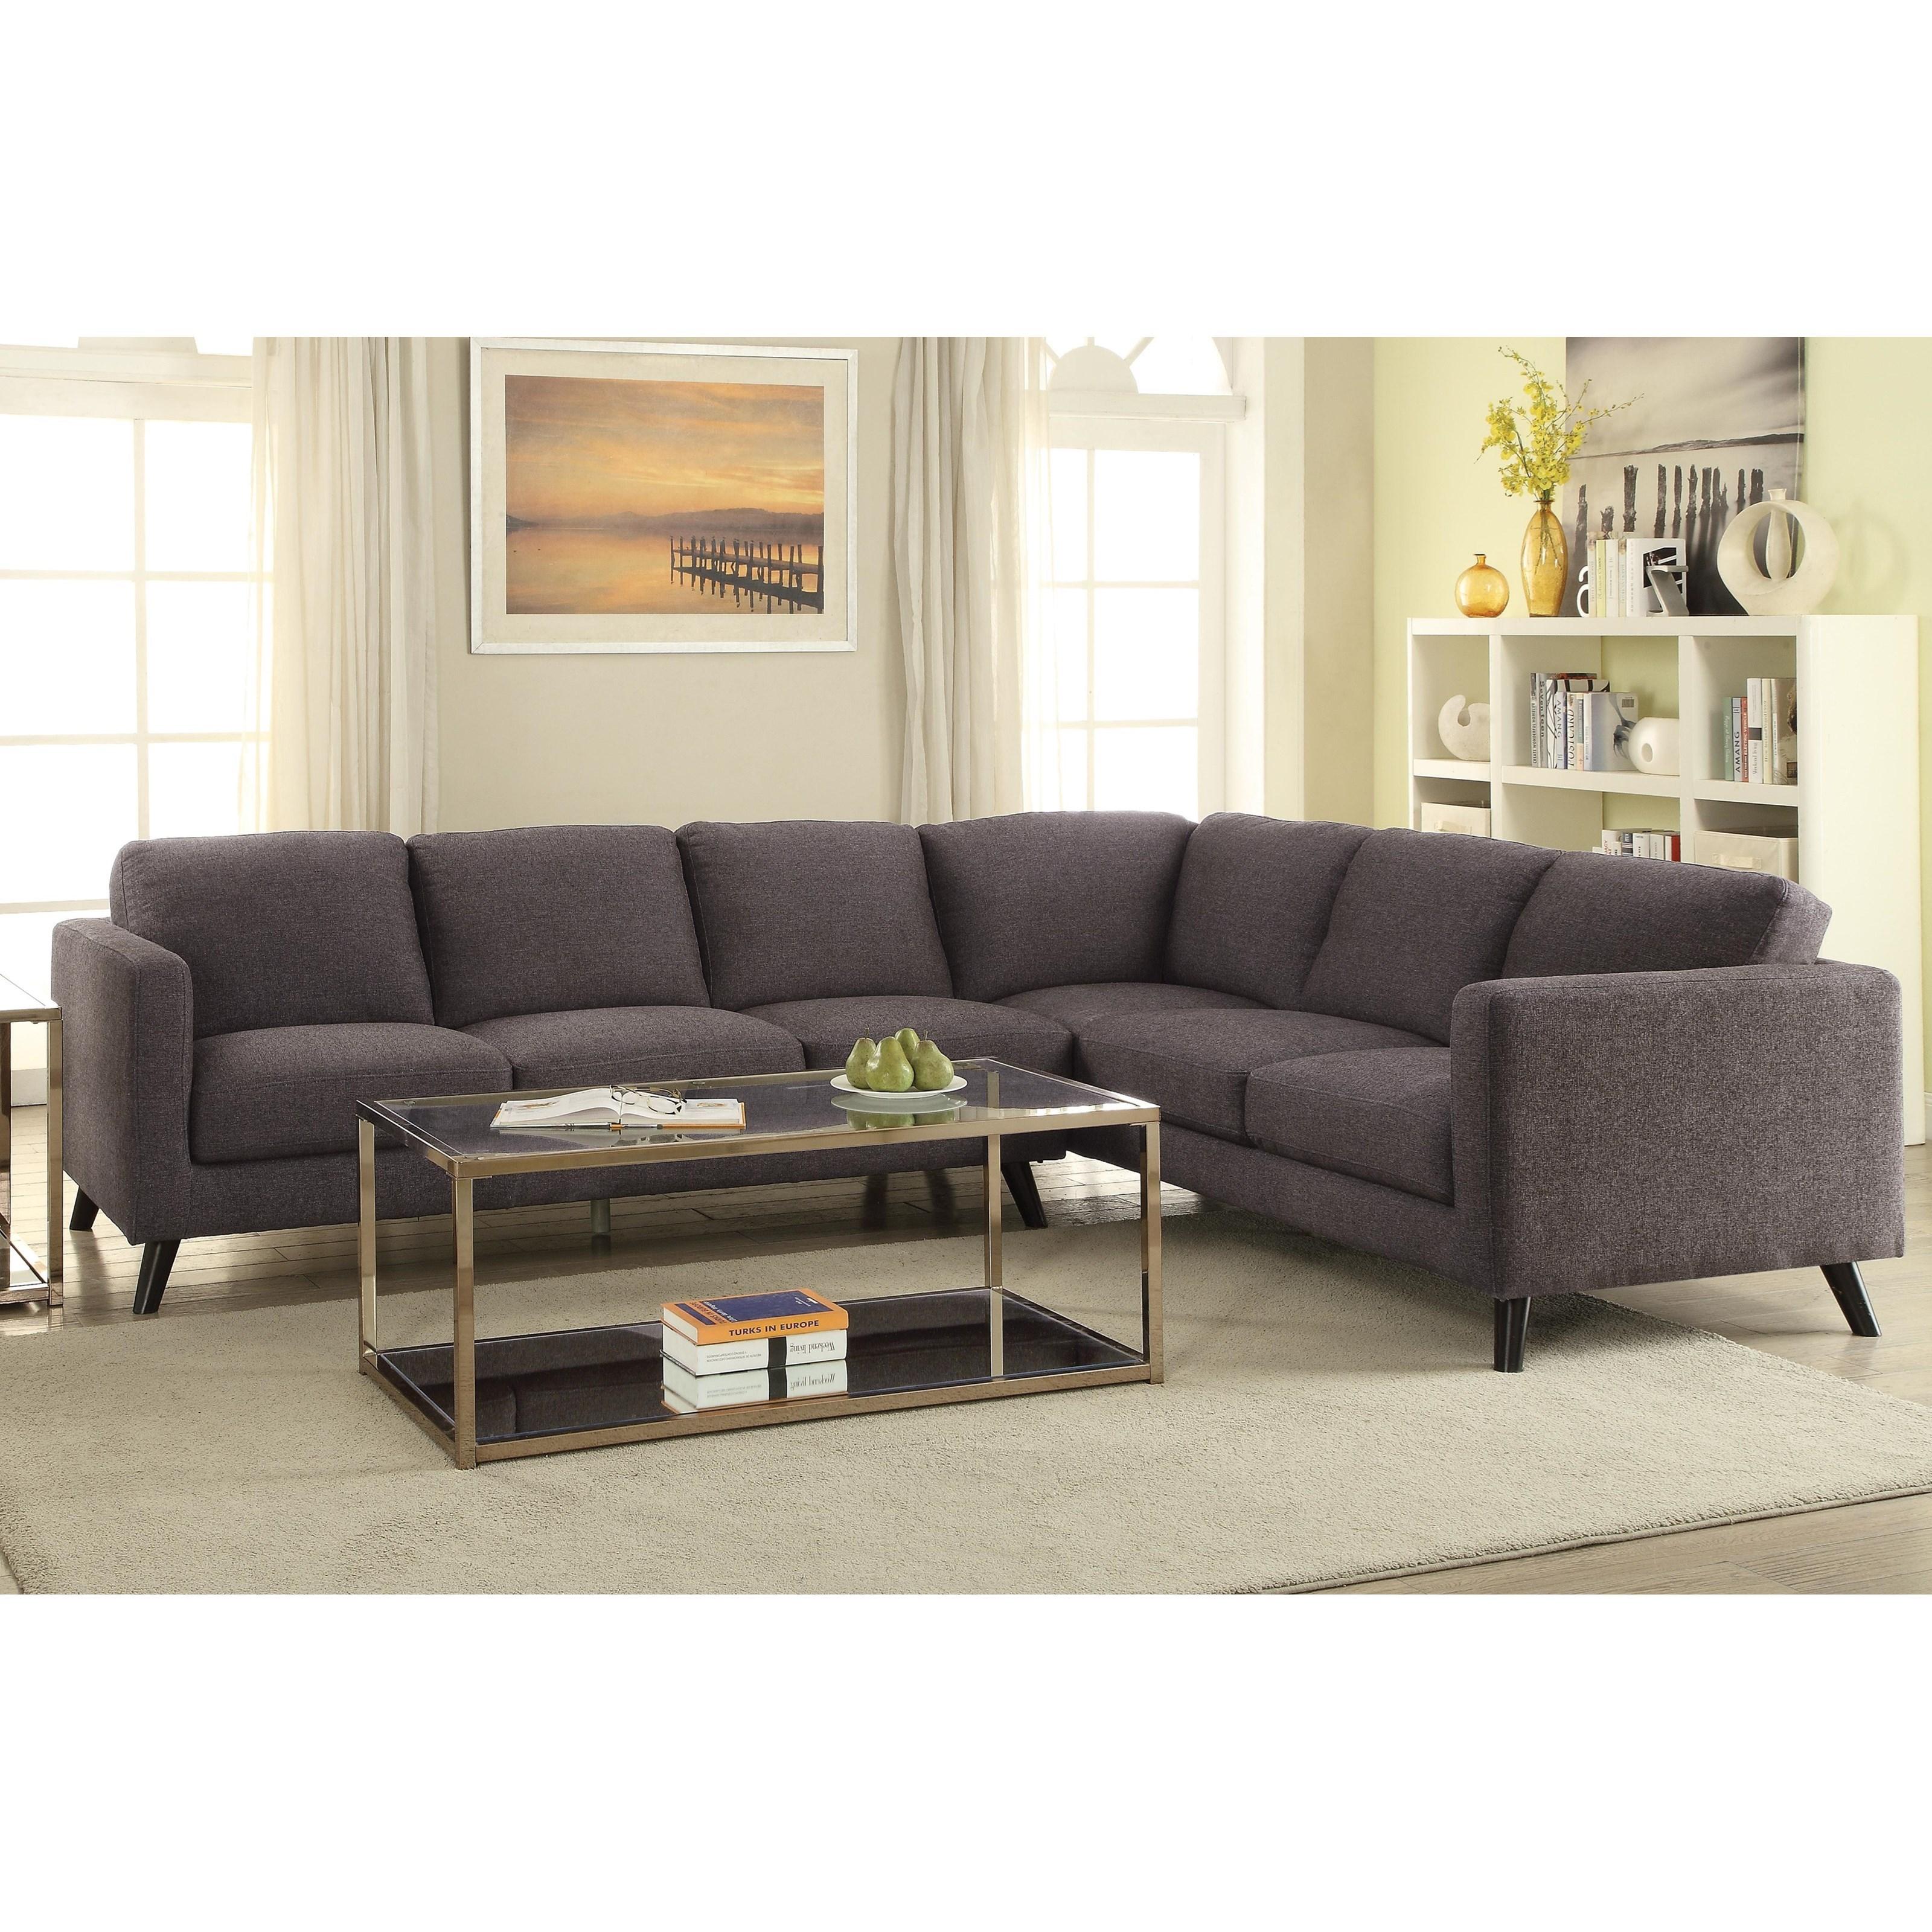 Coaster Azalea Mid Century Modern Sectional Value City Furniture Sectional Sofas